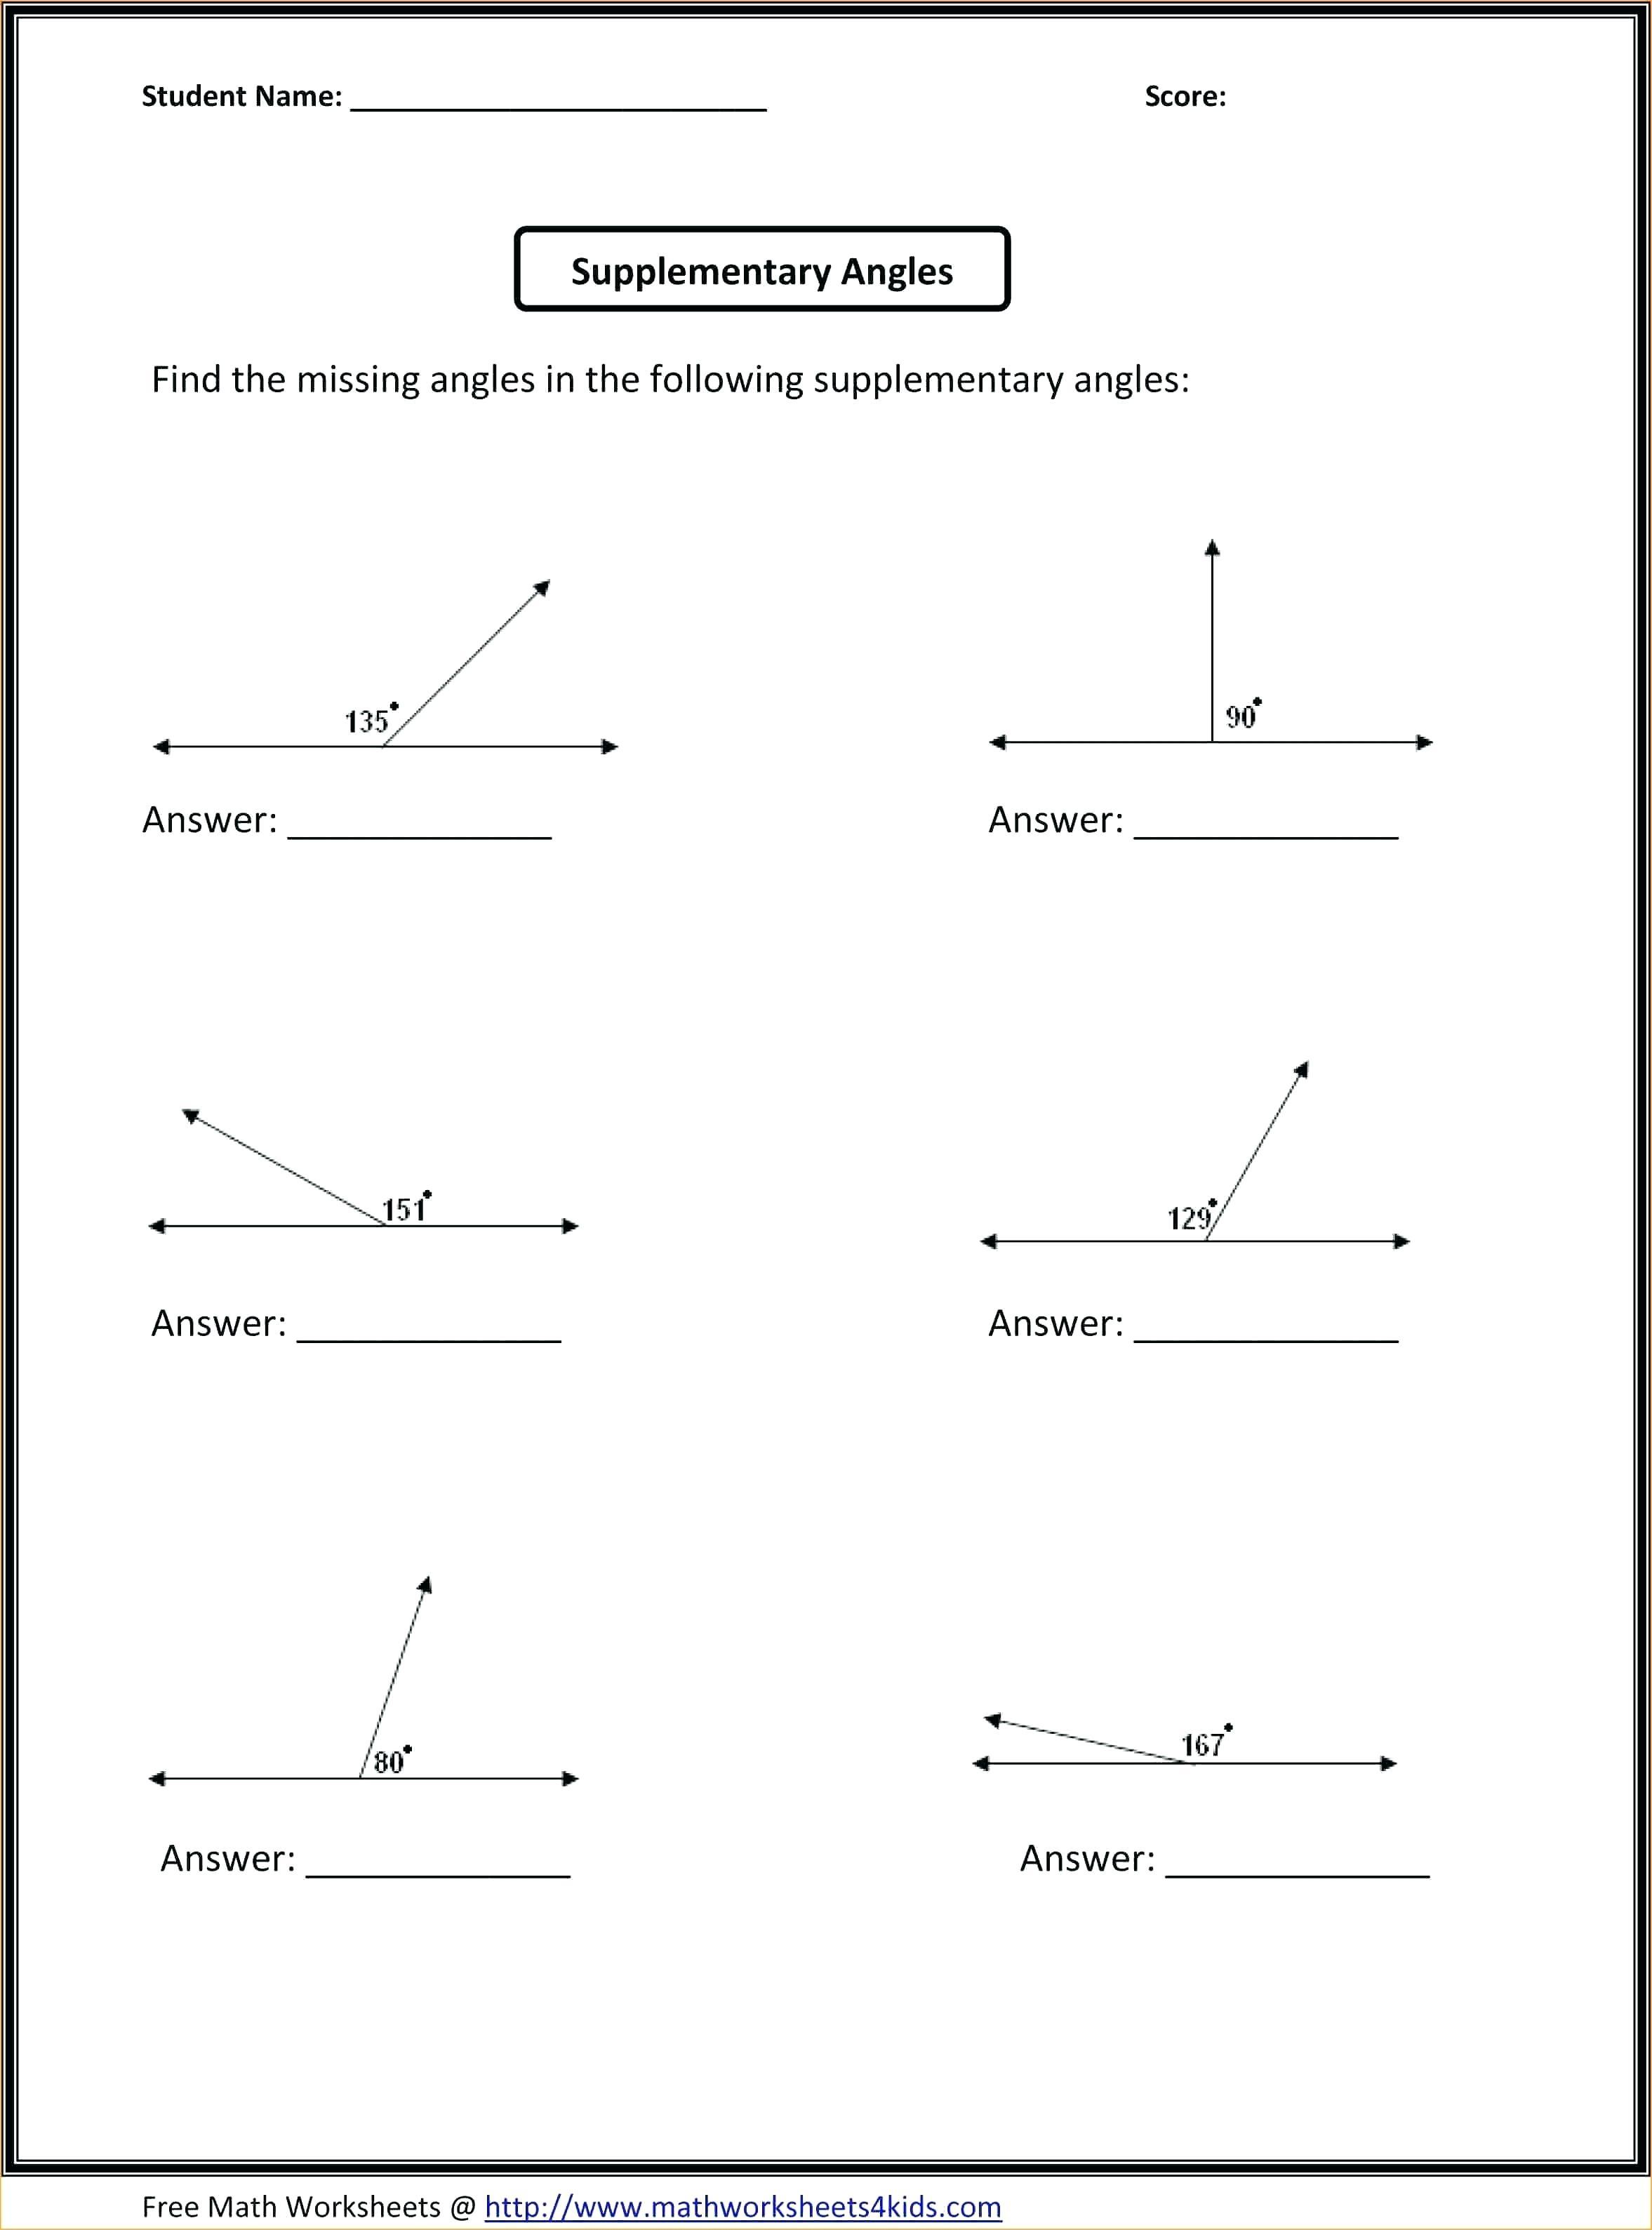 Basic Geometry Worksheets Math Grade Geometry Worksheets - Free Printable Geometry Worksheets For Middle School